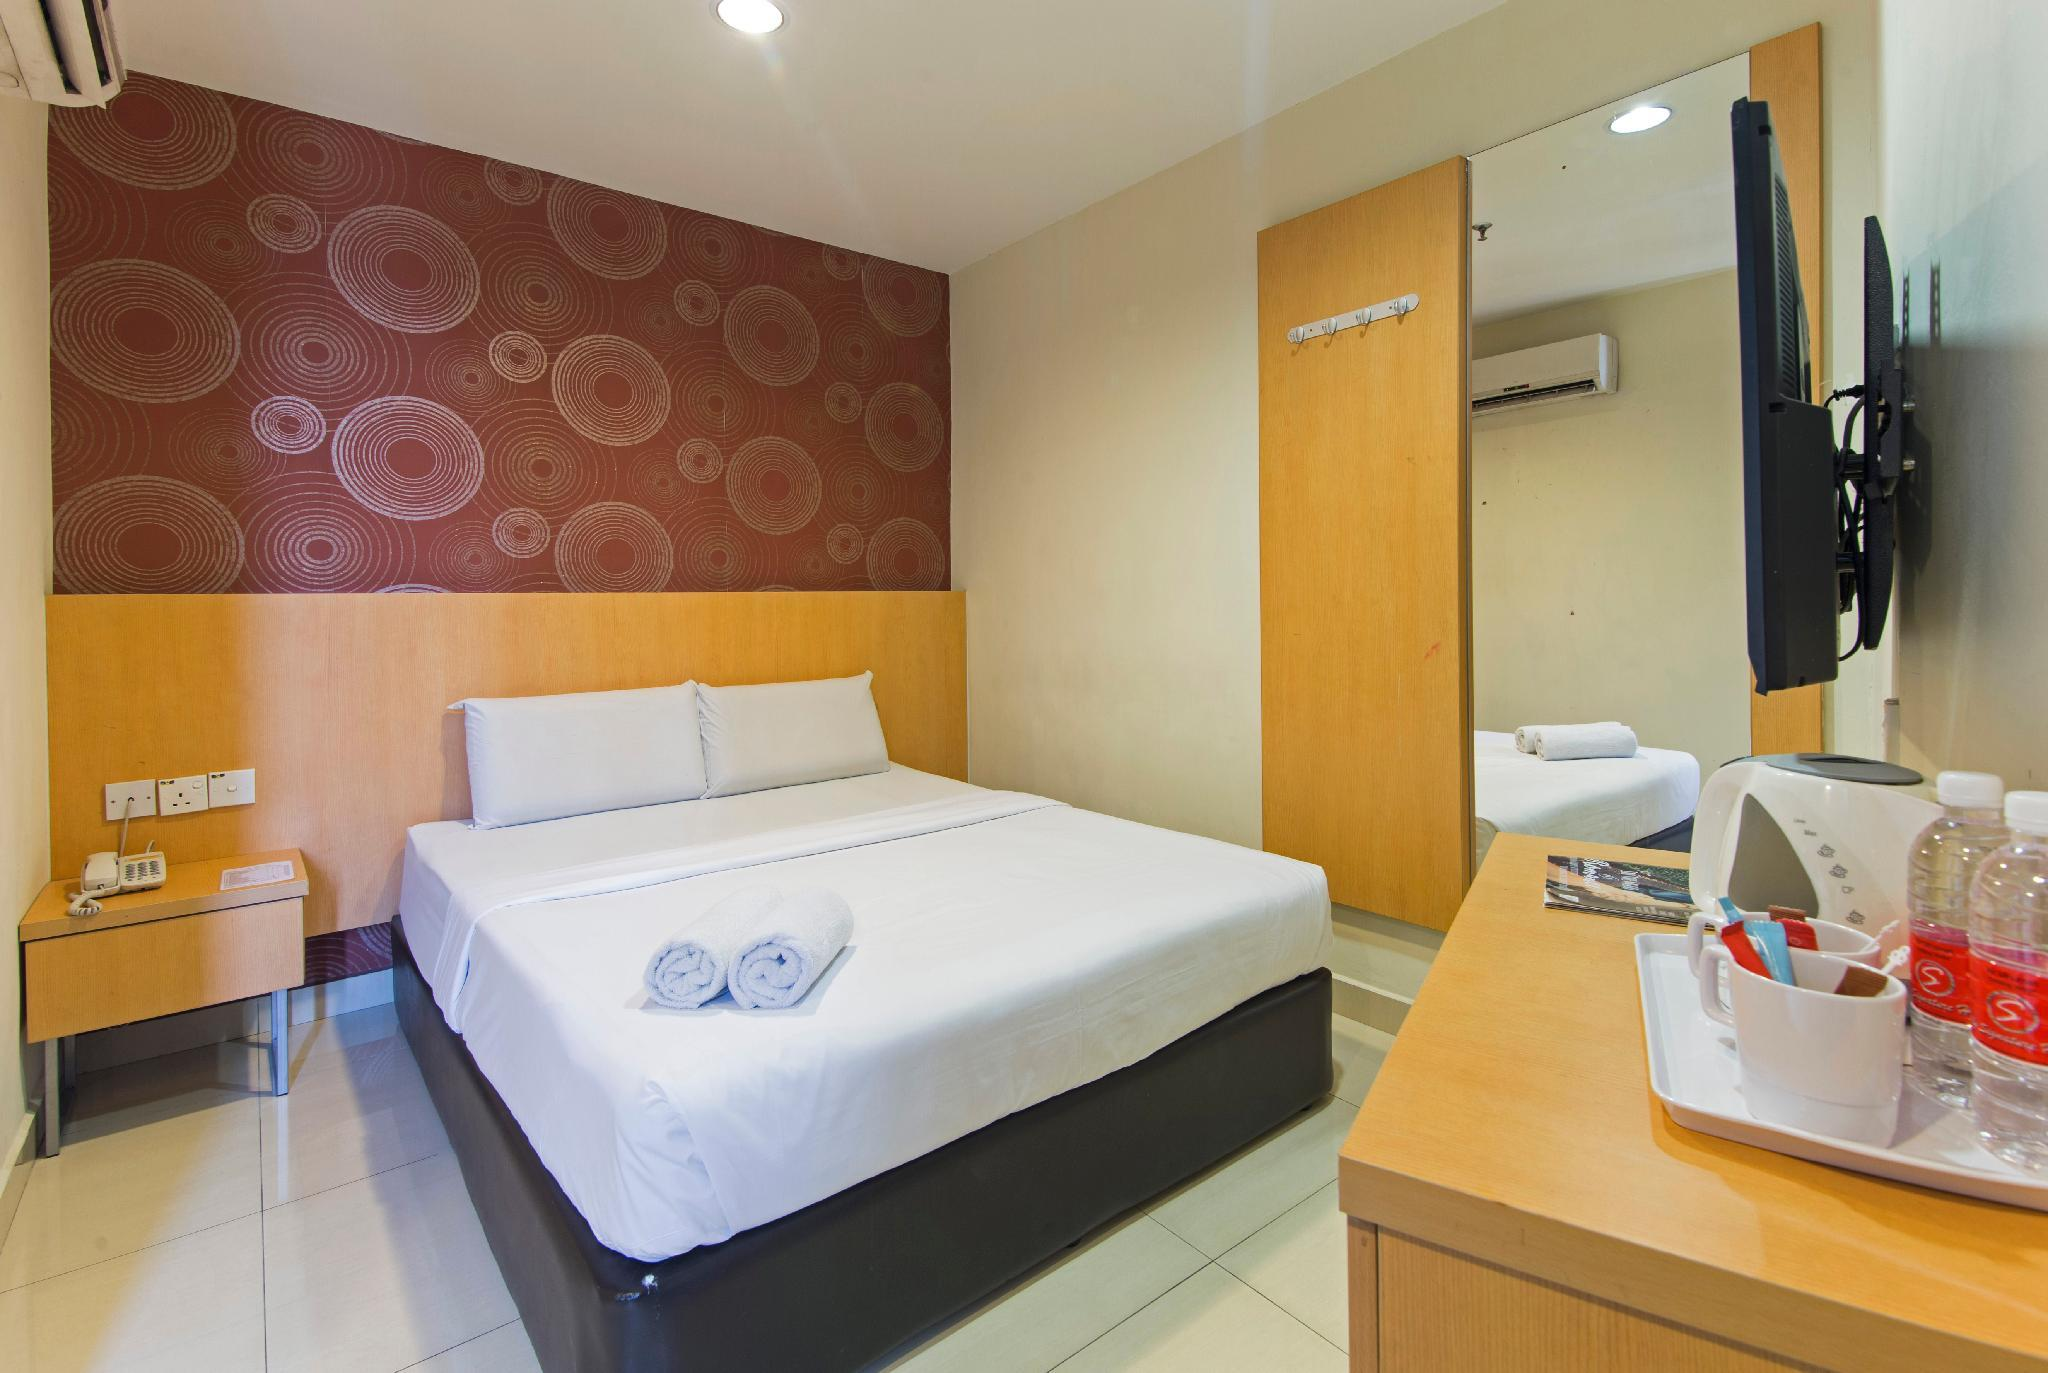 Signature Hotel Puchong @ Setiawalk, Kuala Lumpur